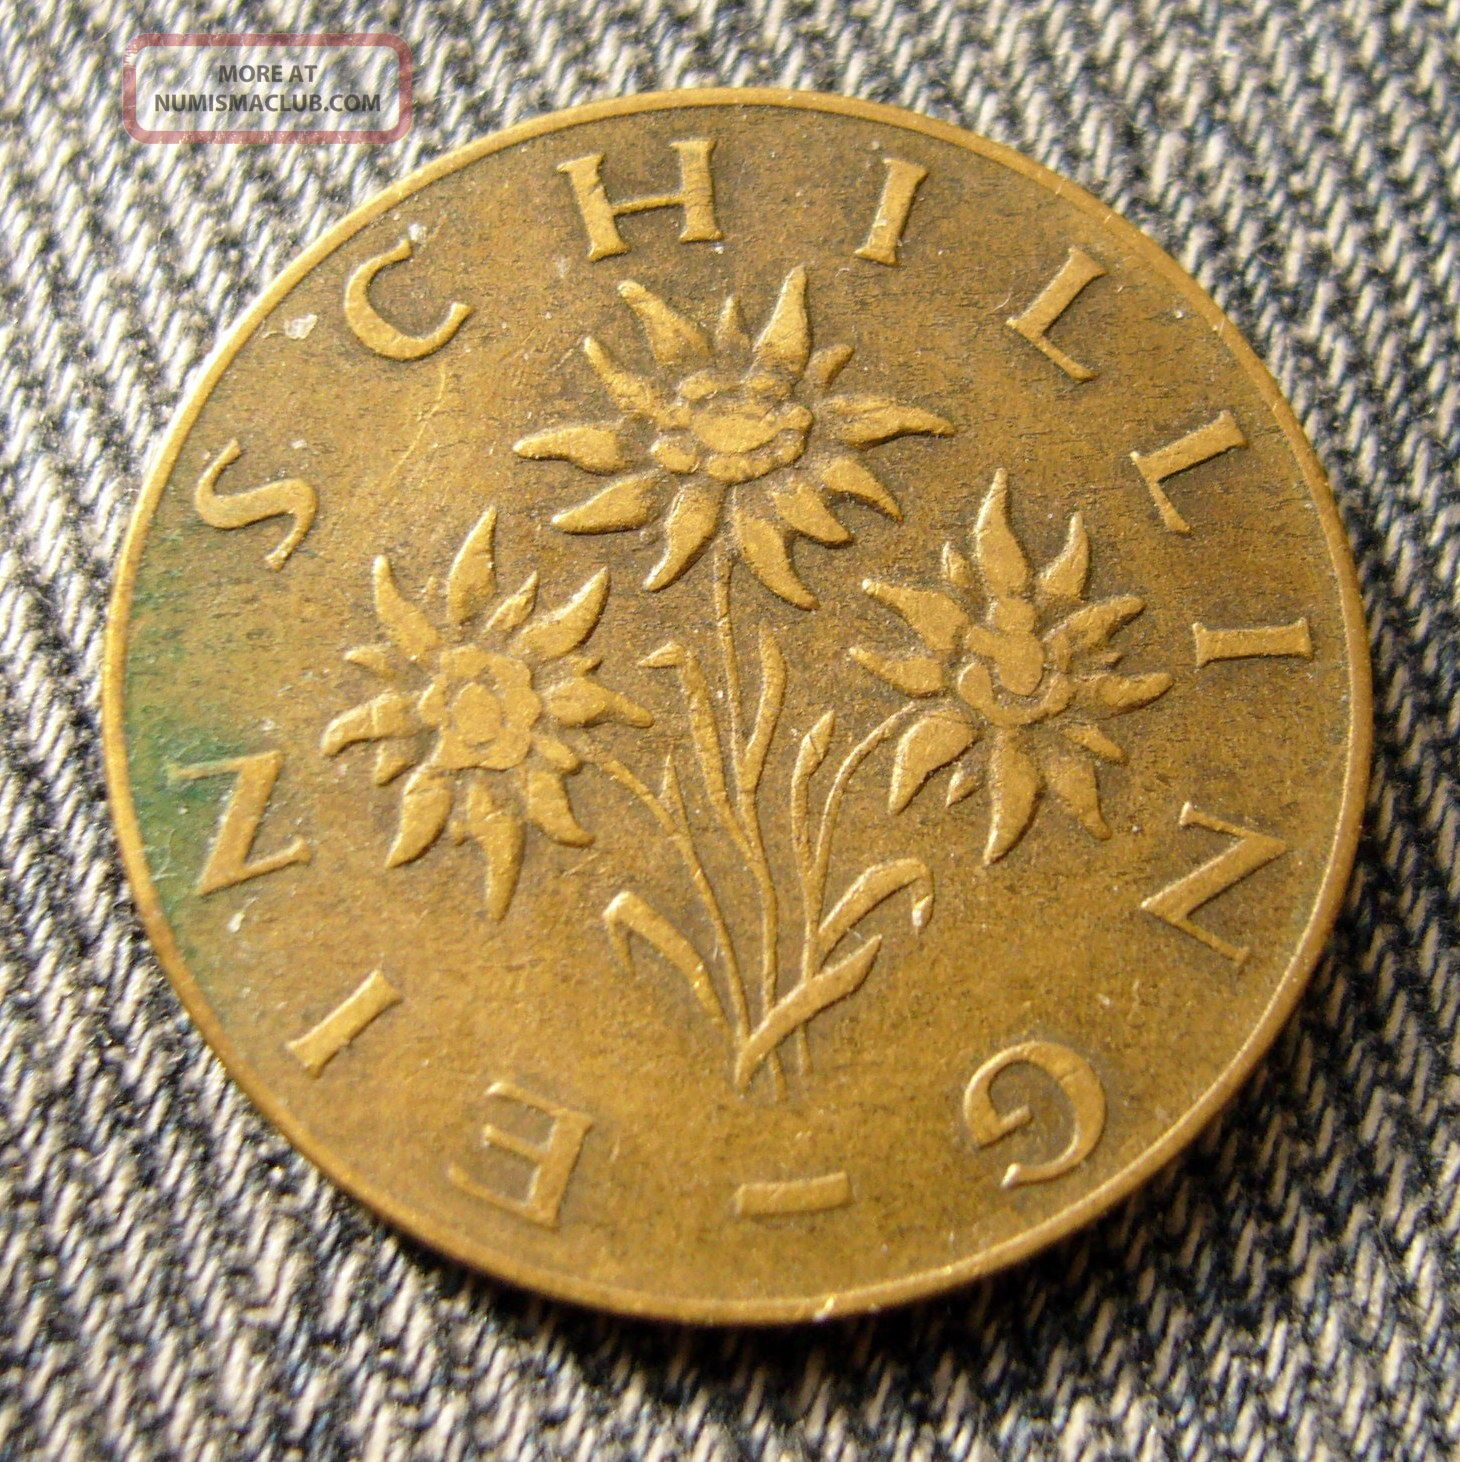 1959 Austria 1 Schilling Coin